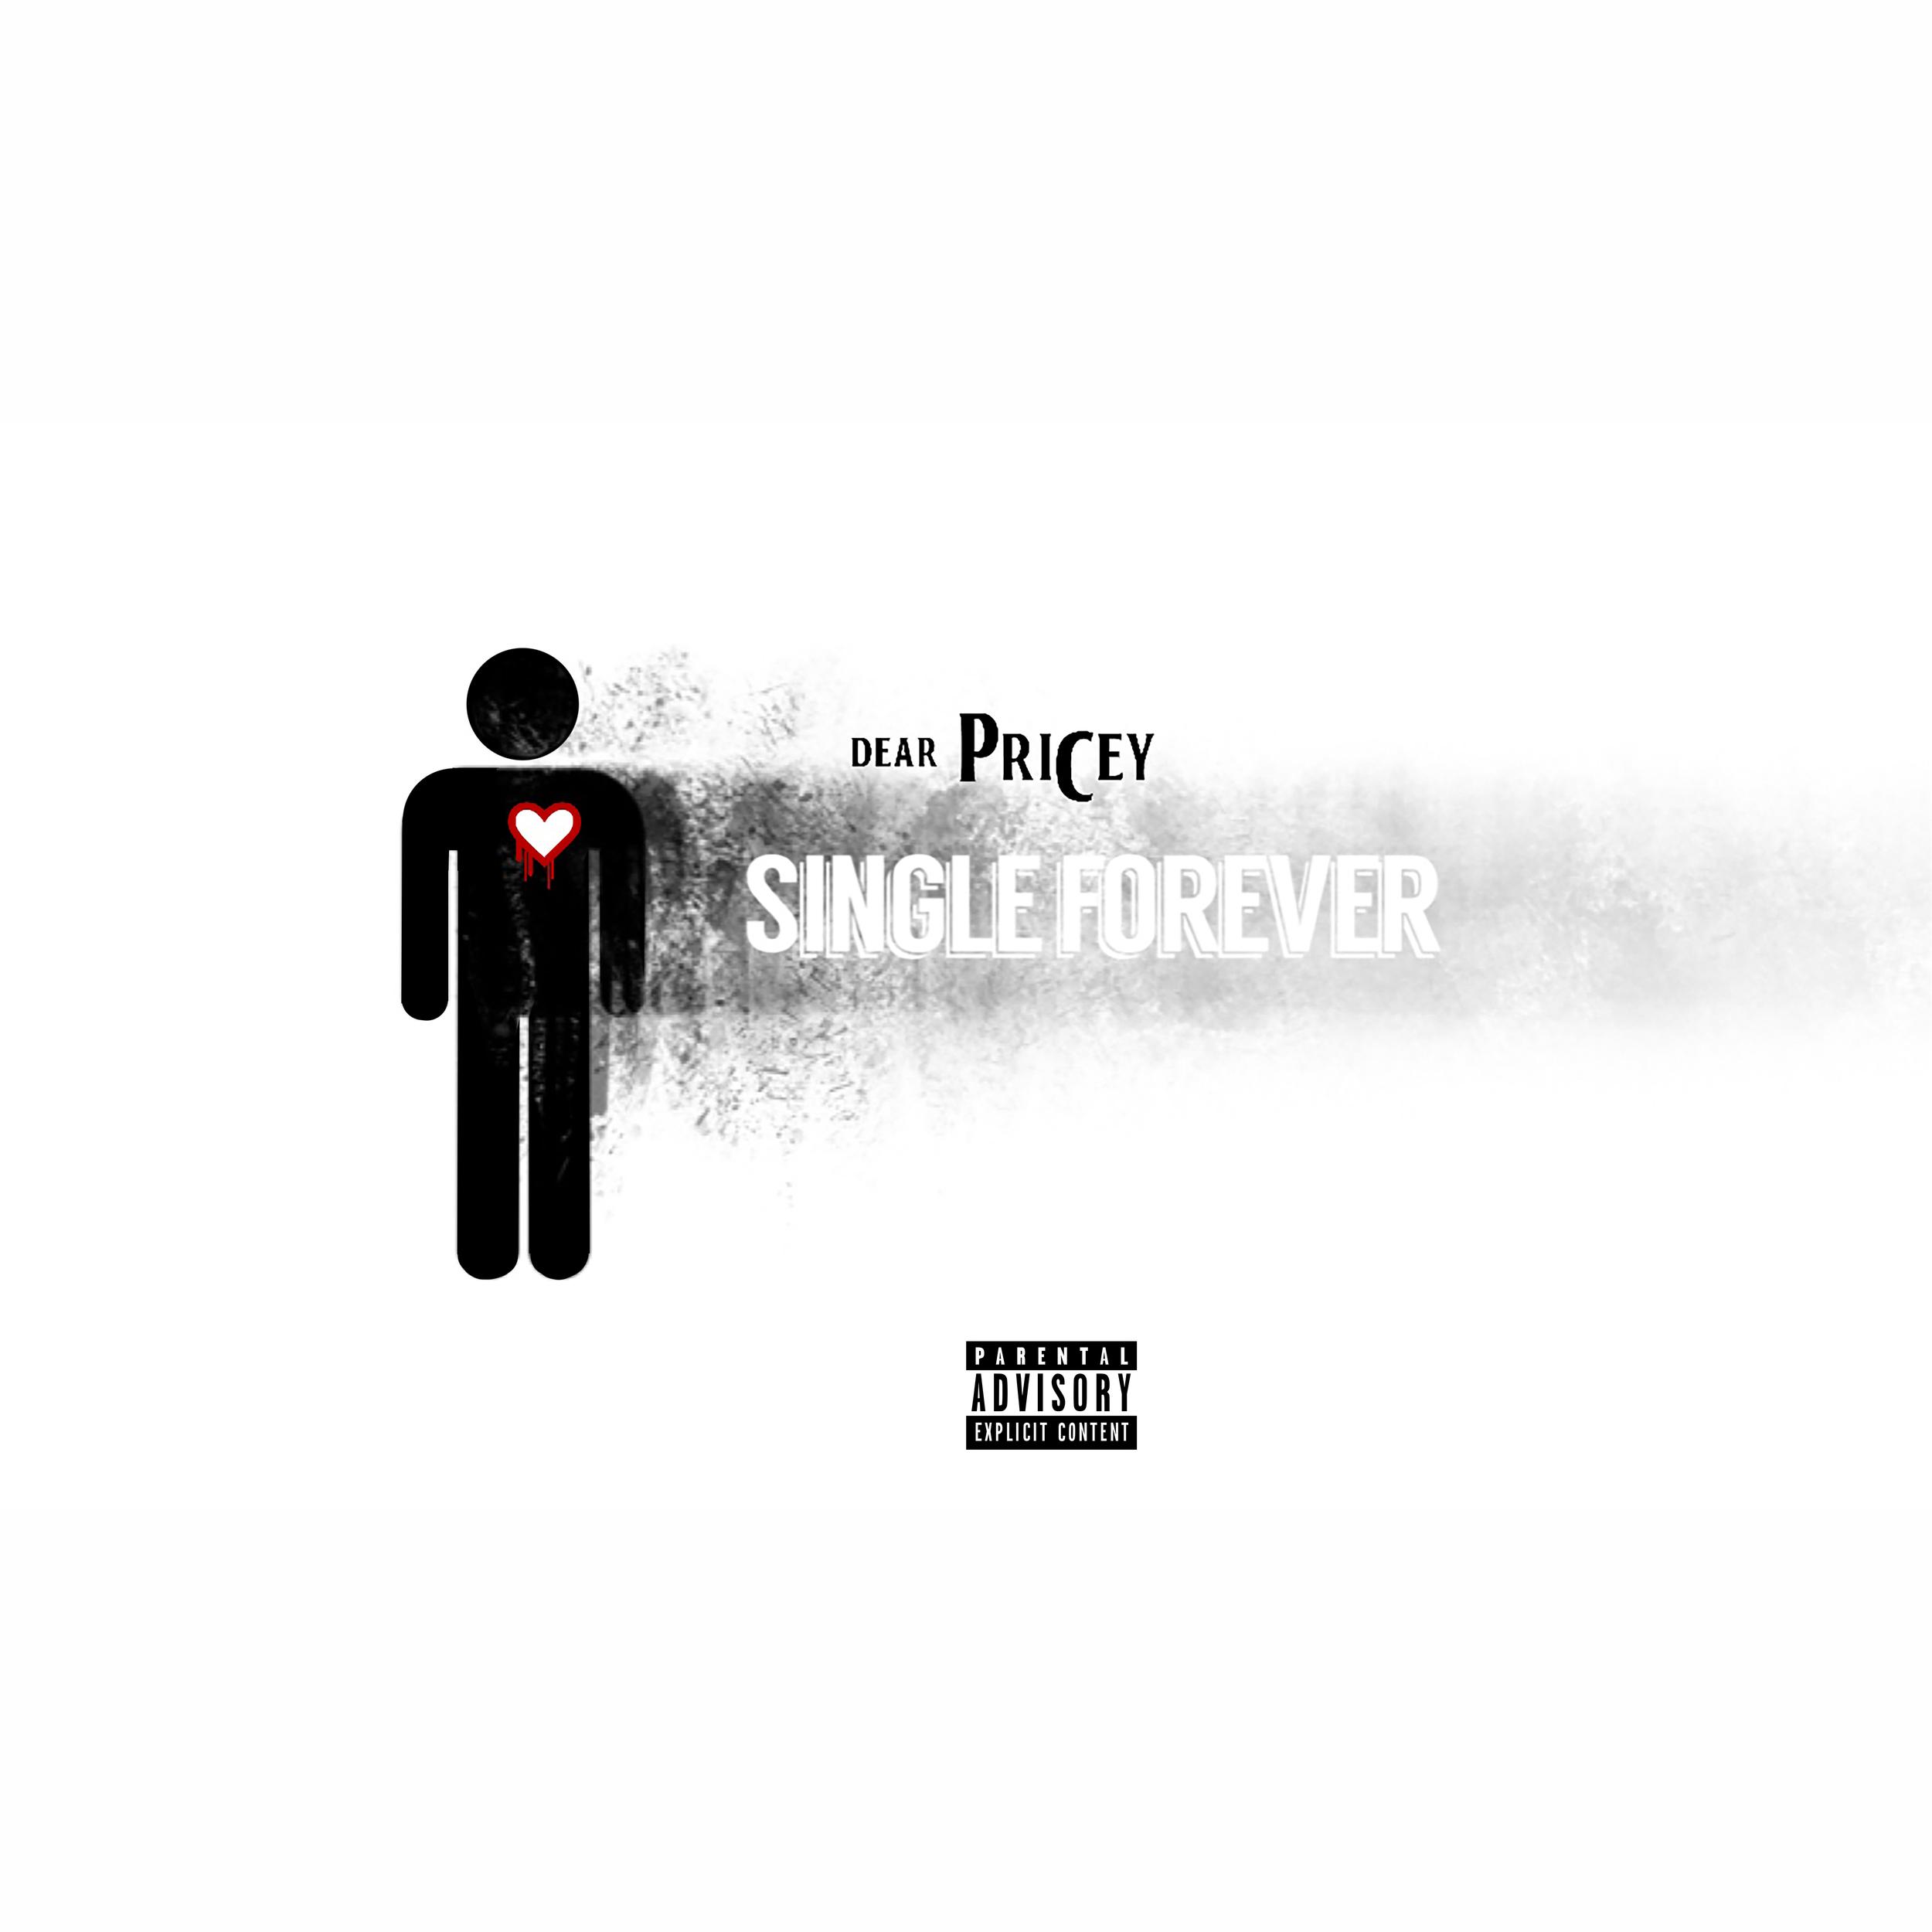 pricey single forever.jpg